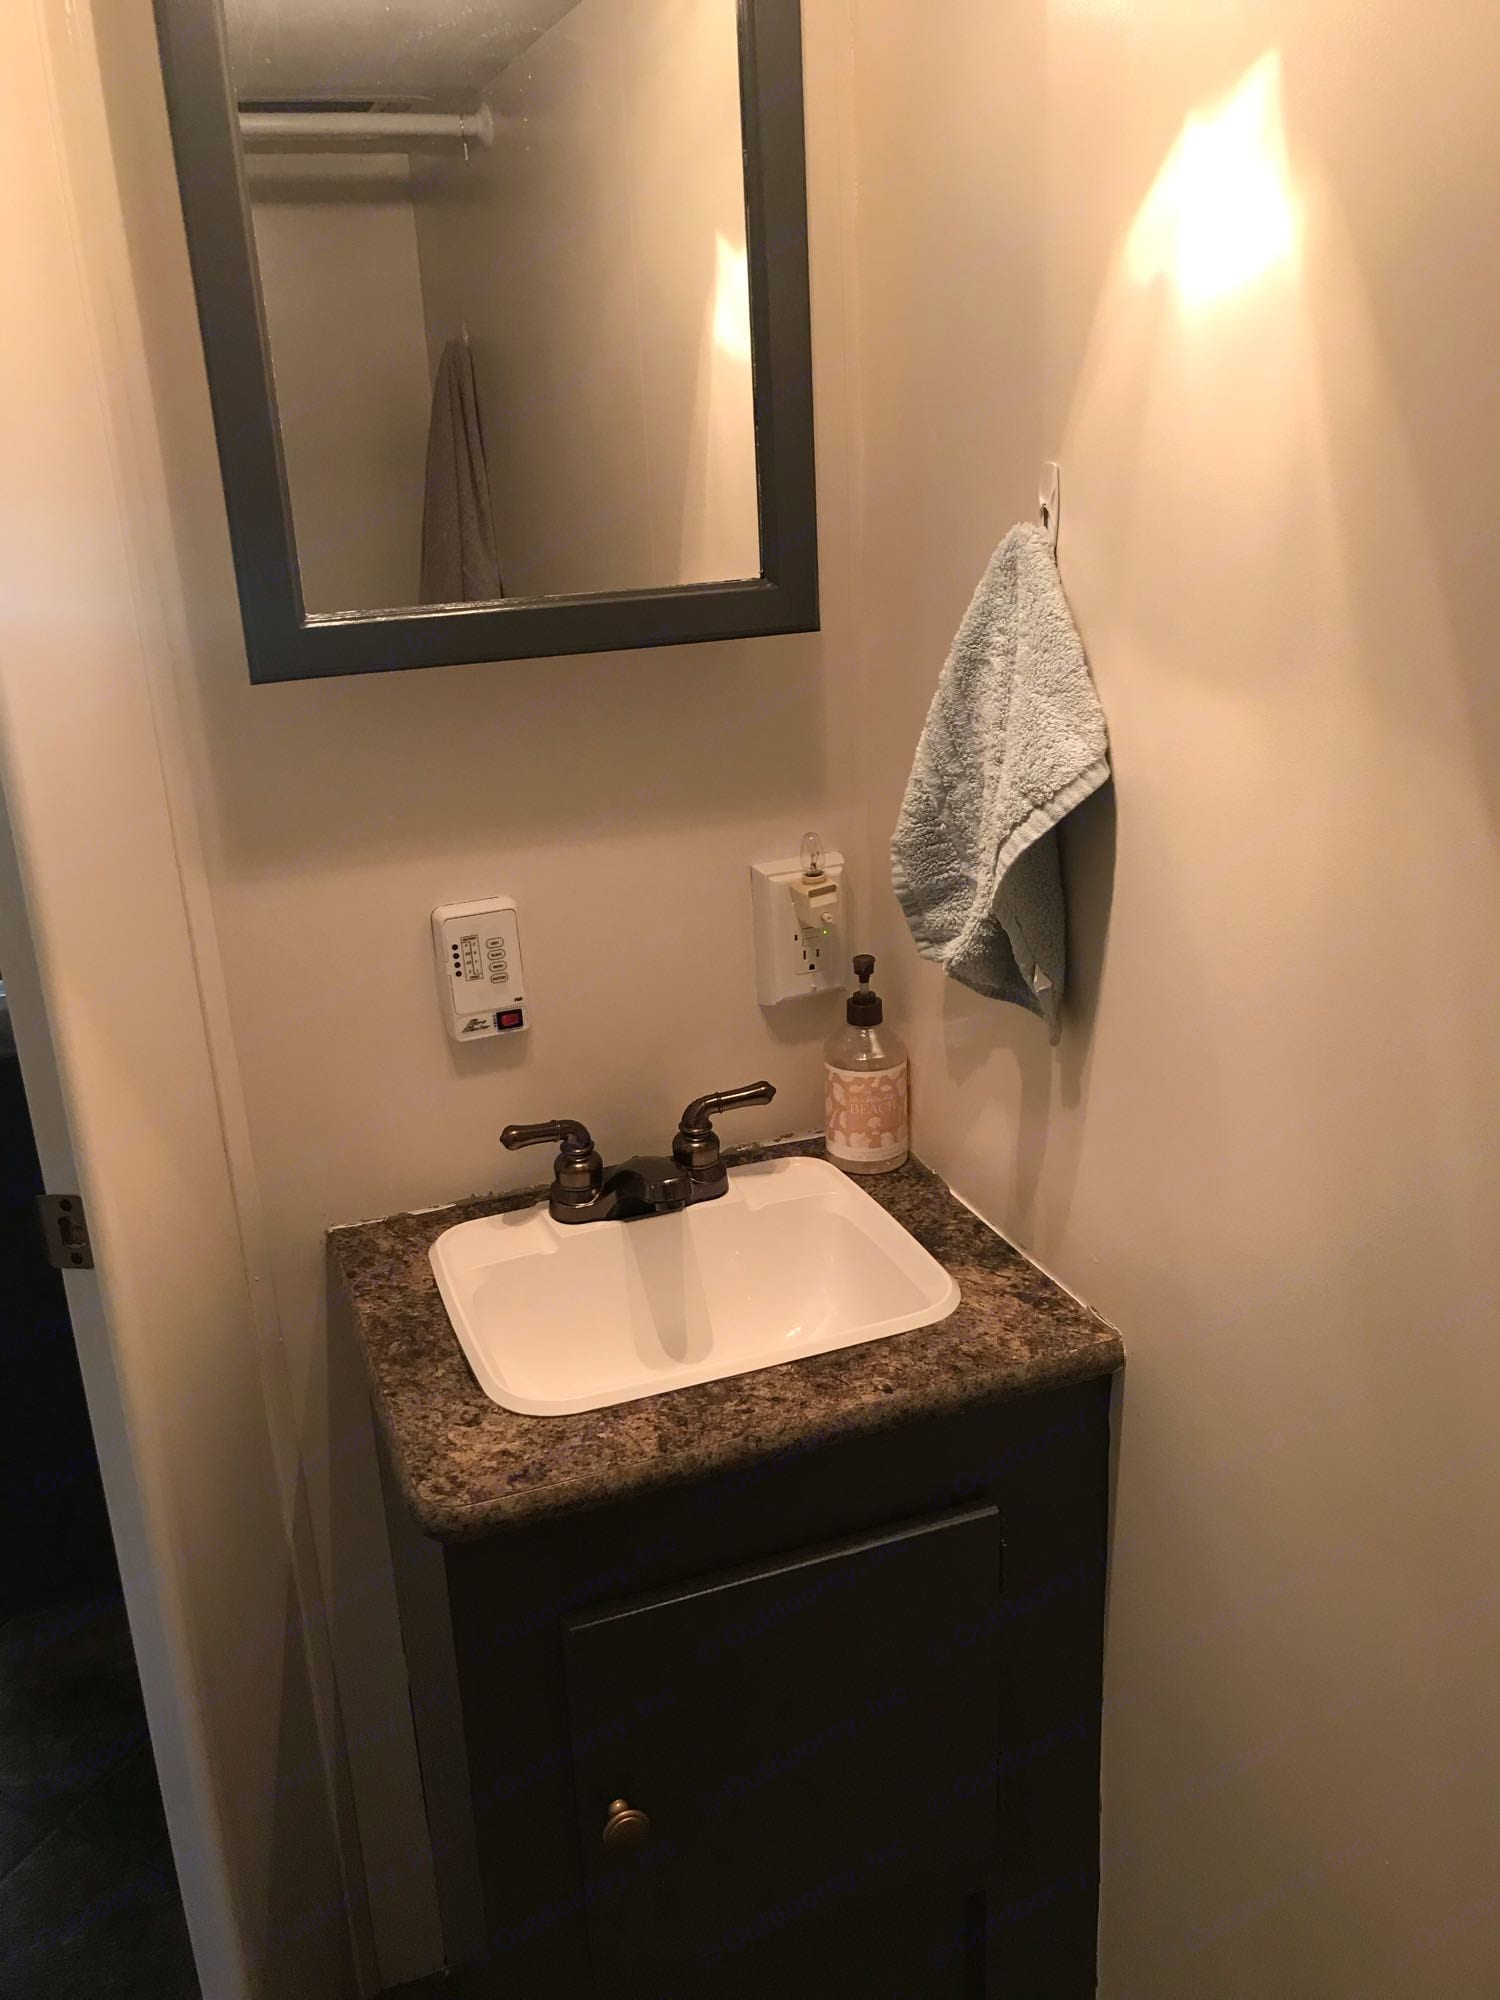 Bathroom sink. K-Z Manufacturing Spree 2013